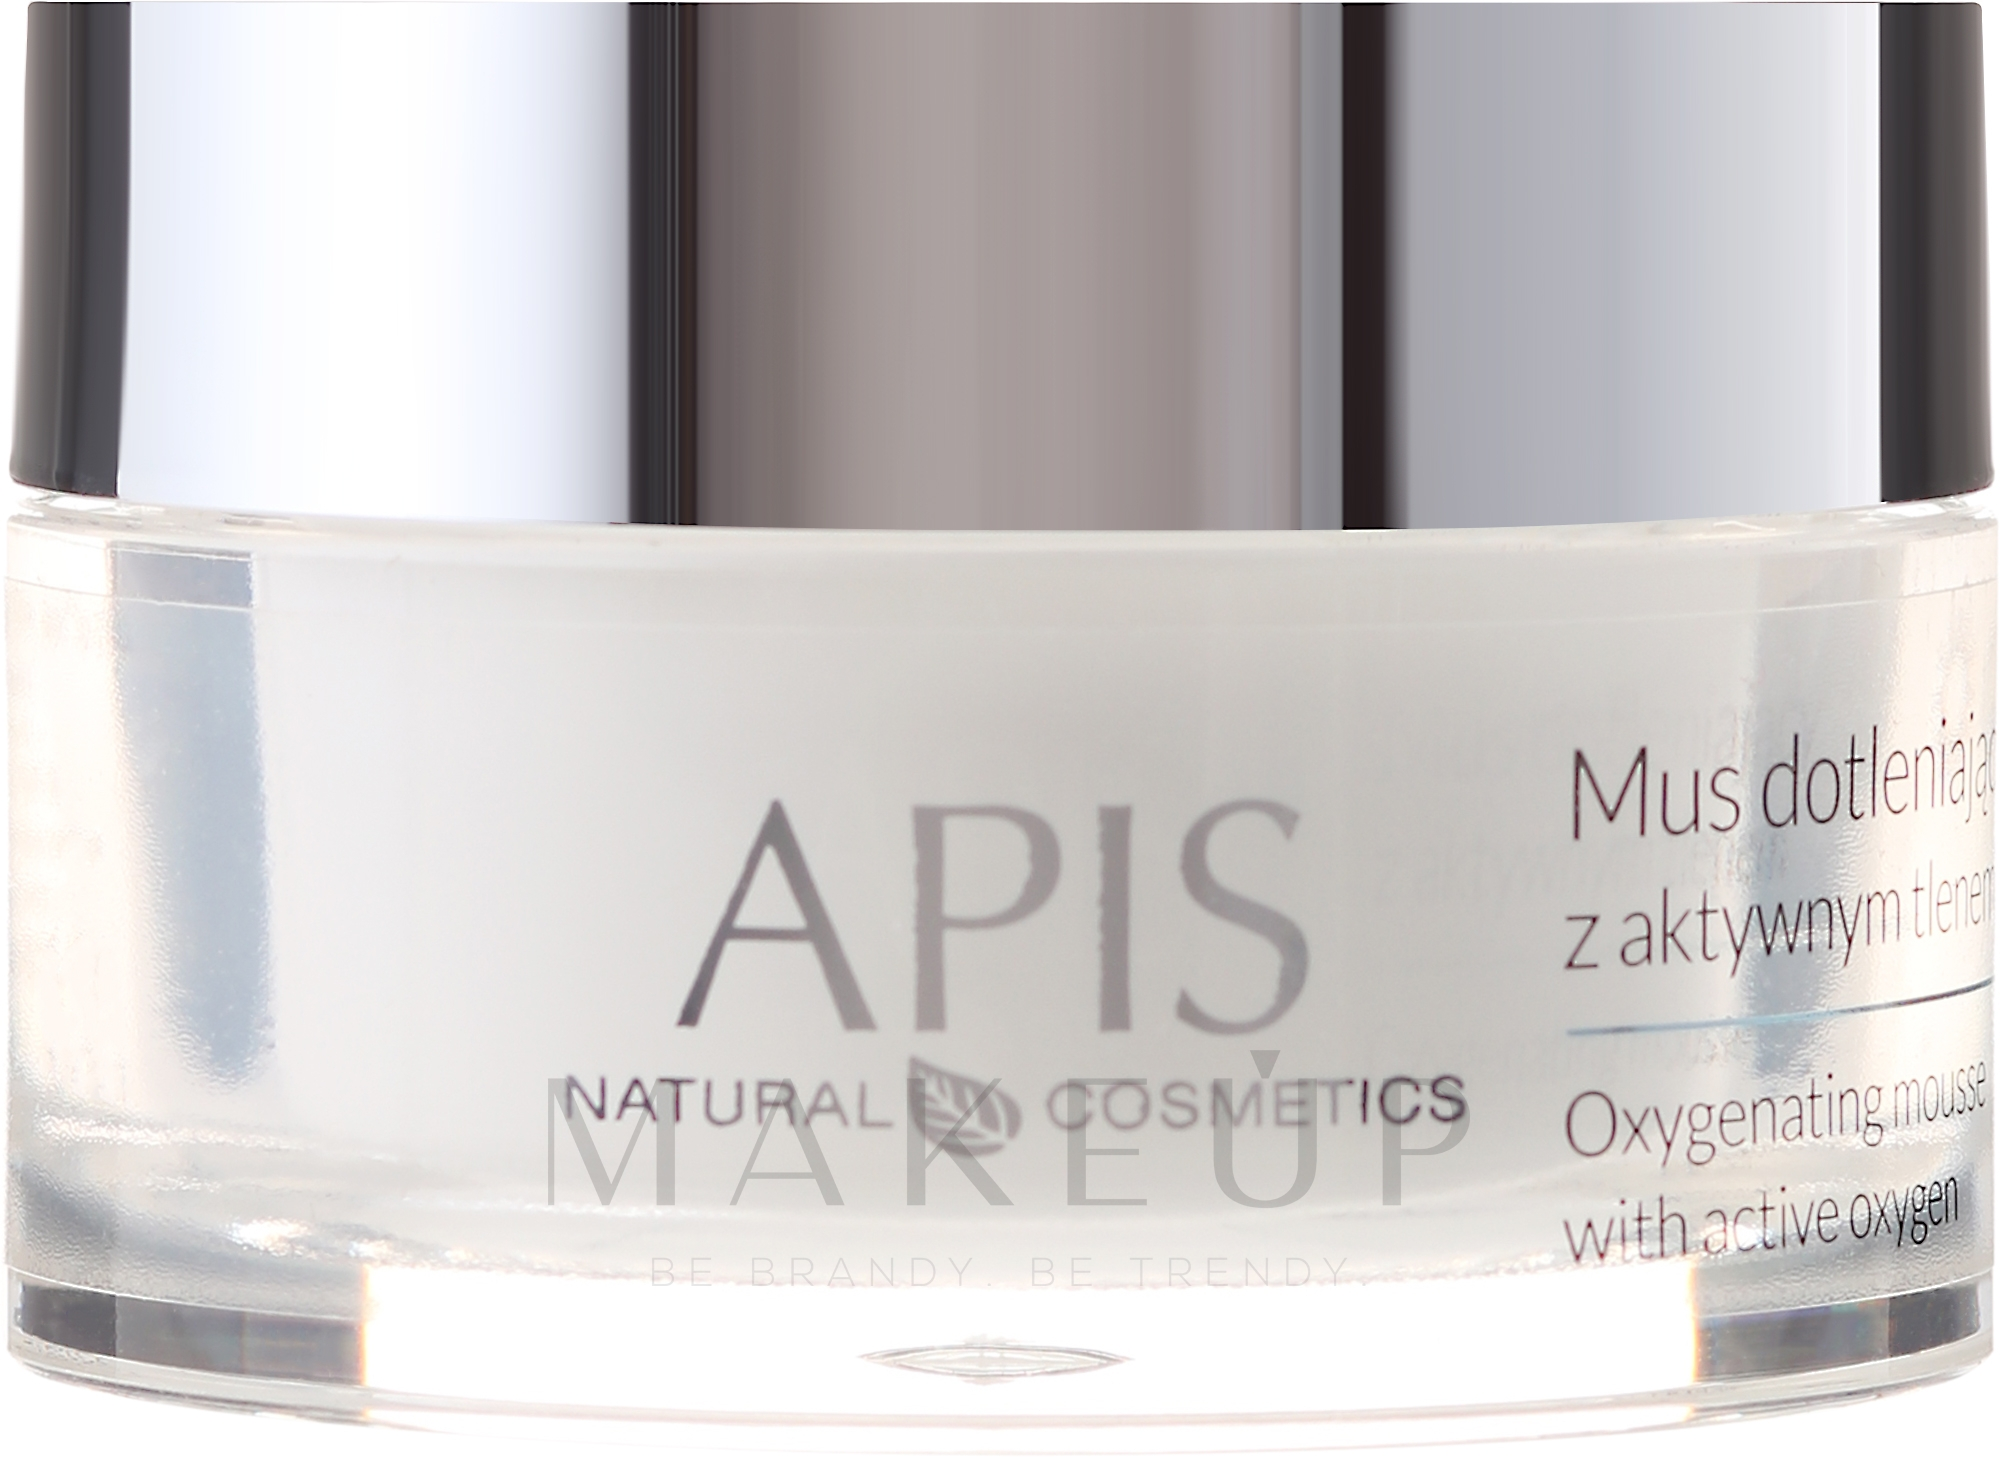 Creme-Mousse für das Gesicht mit aktivem Sauerstoff - APIS Professional Home TerApis Oxygenating Mousse — Bild 50 ml